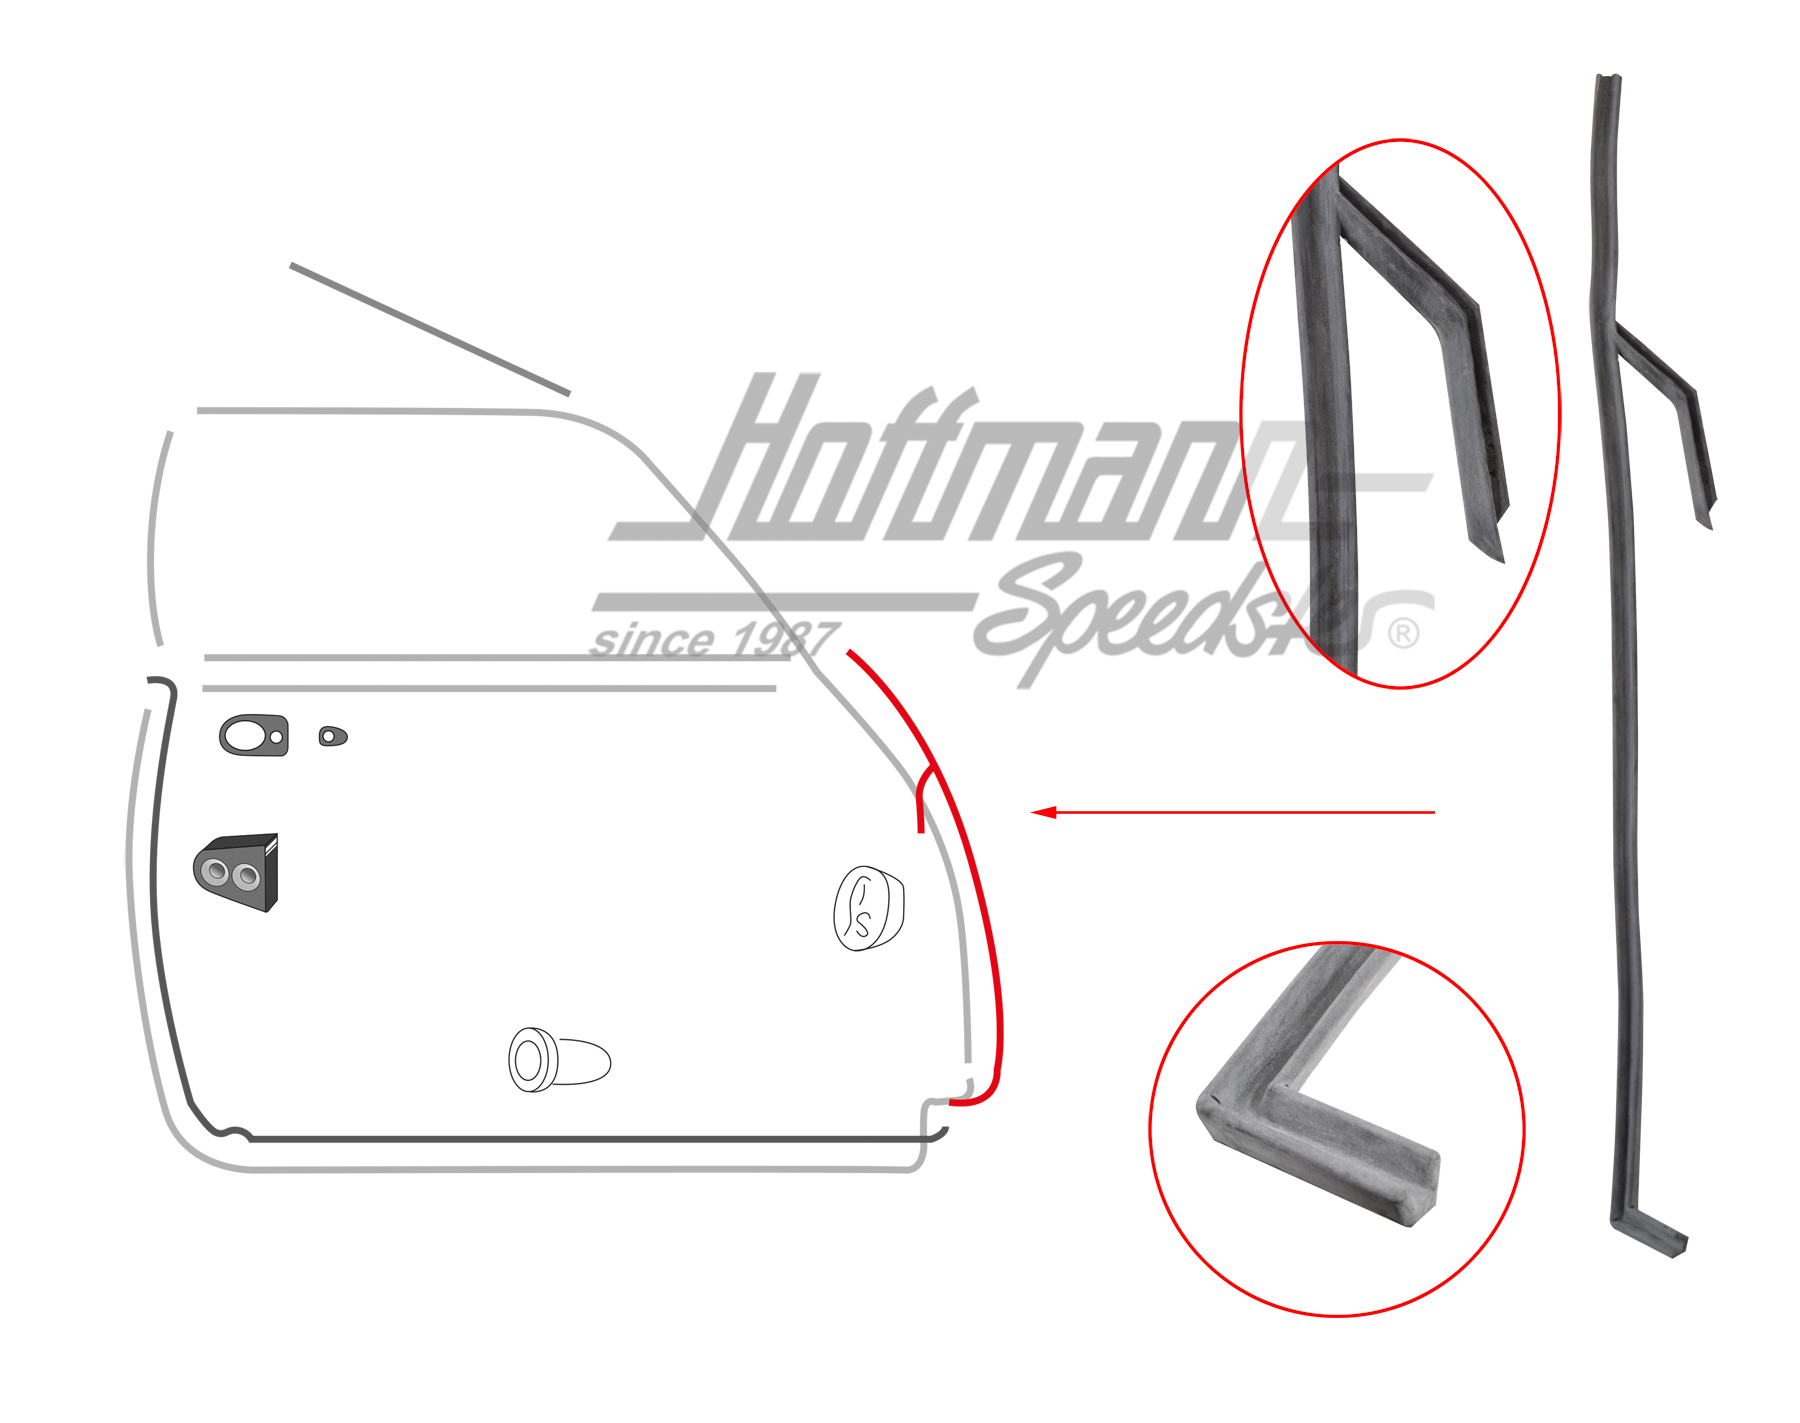 2x Hofmann type 706 MOTO-Adhésif Poids Plomb 40 G chromé /> 980210-2 /<